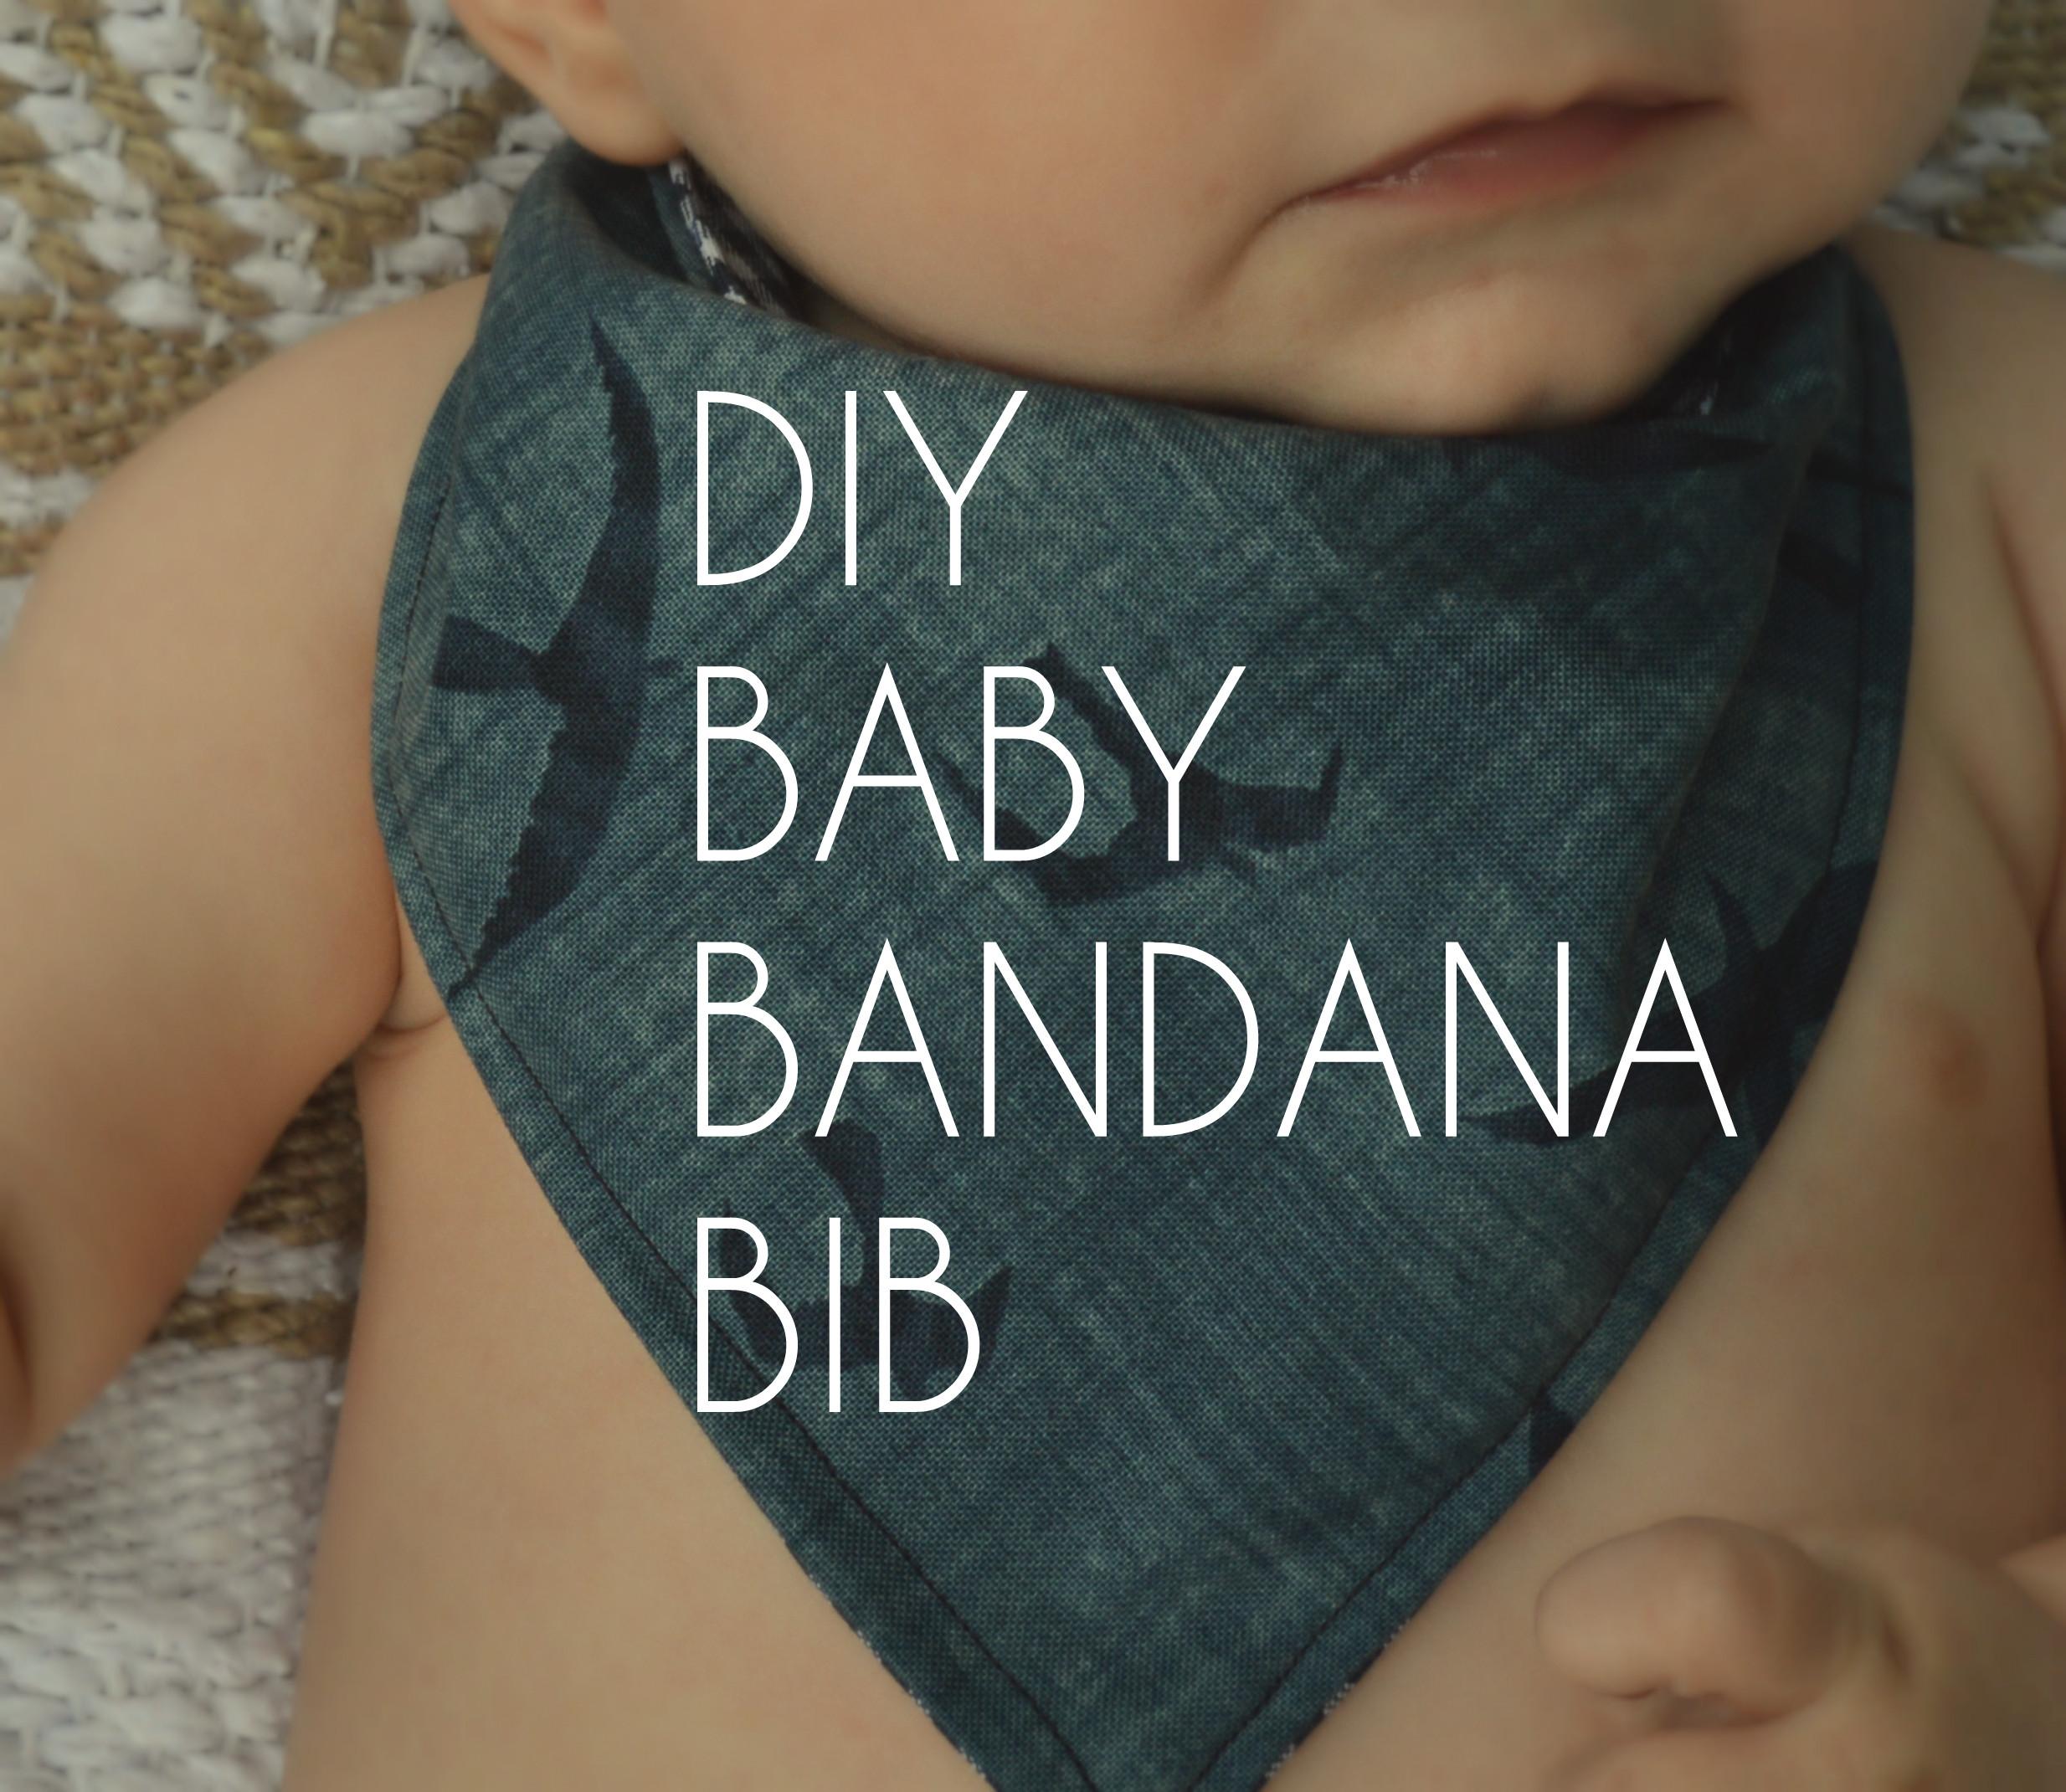 Best ideas about DIY Baby Bibs . Save or Pin DIY Baby Bandana Bibs Now.